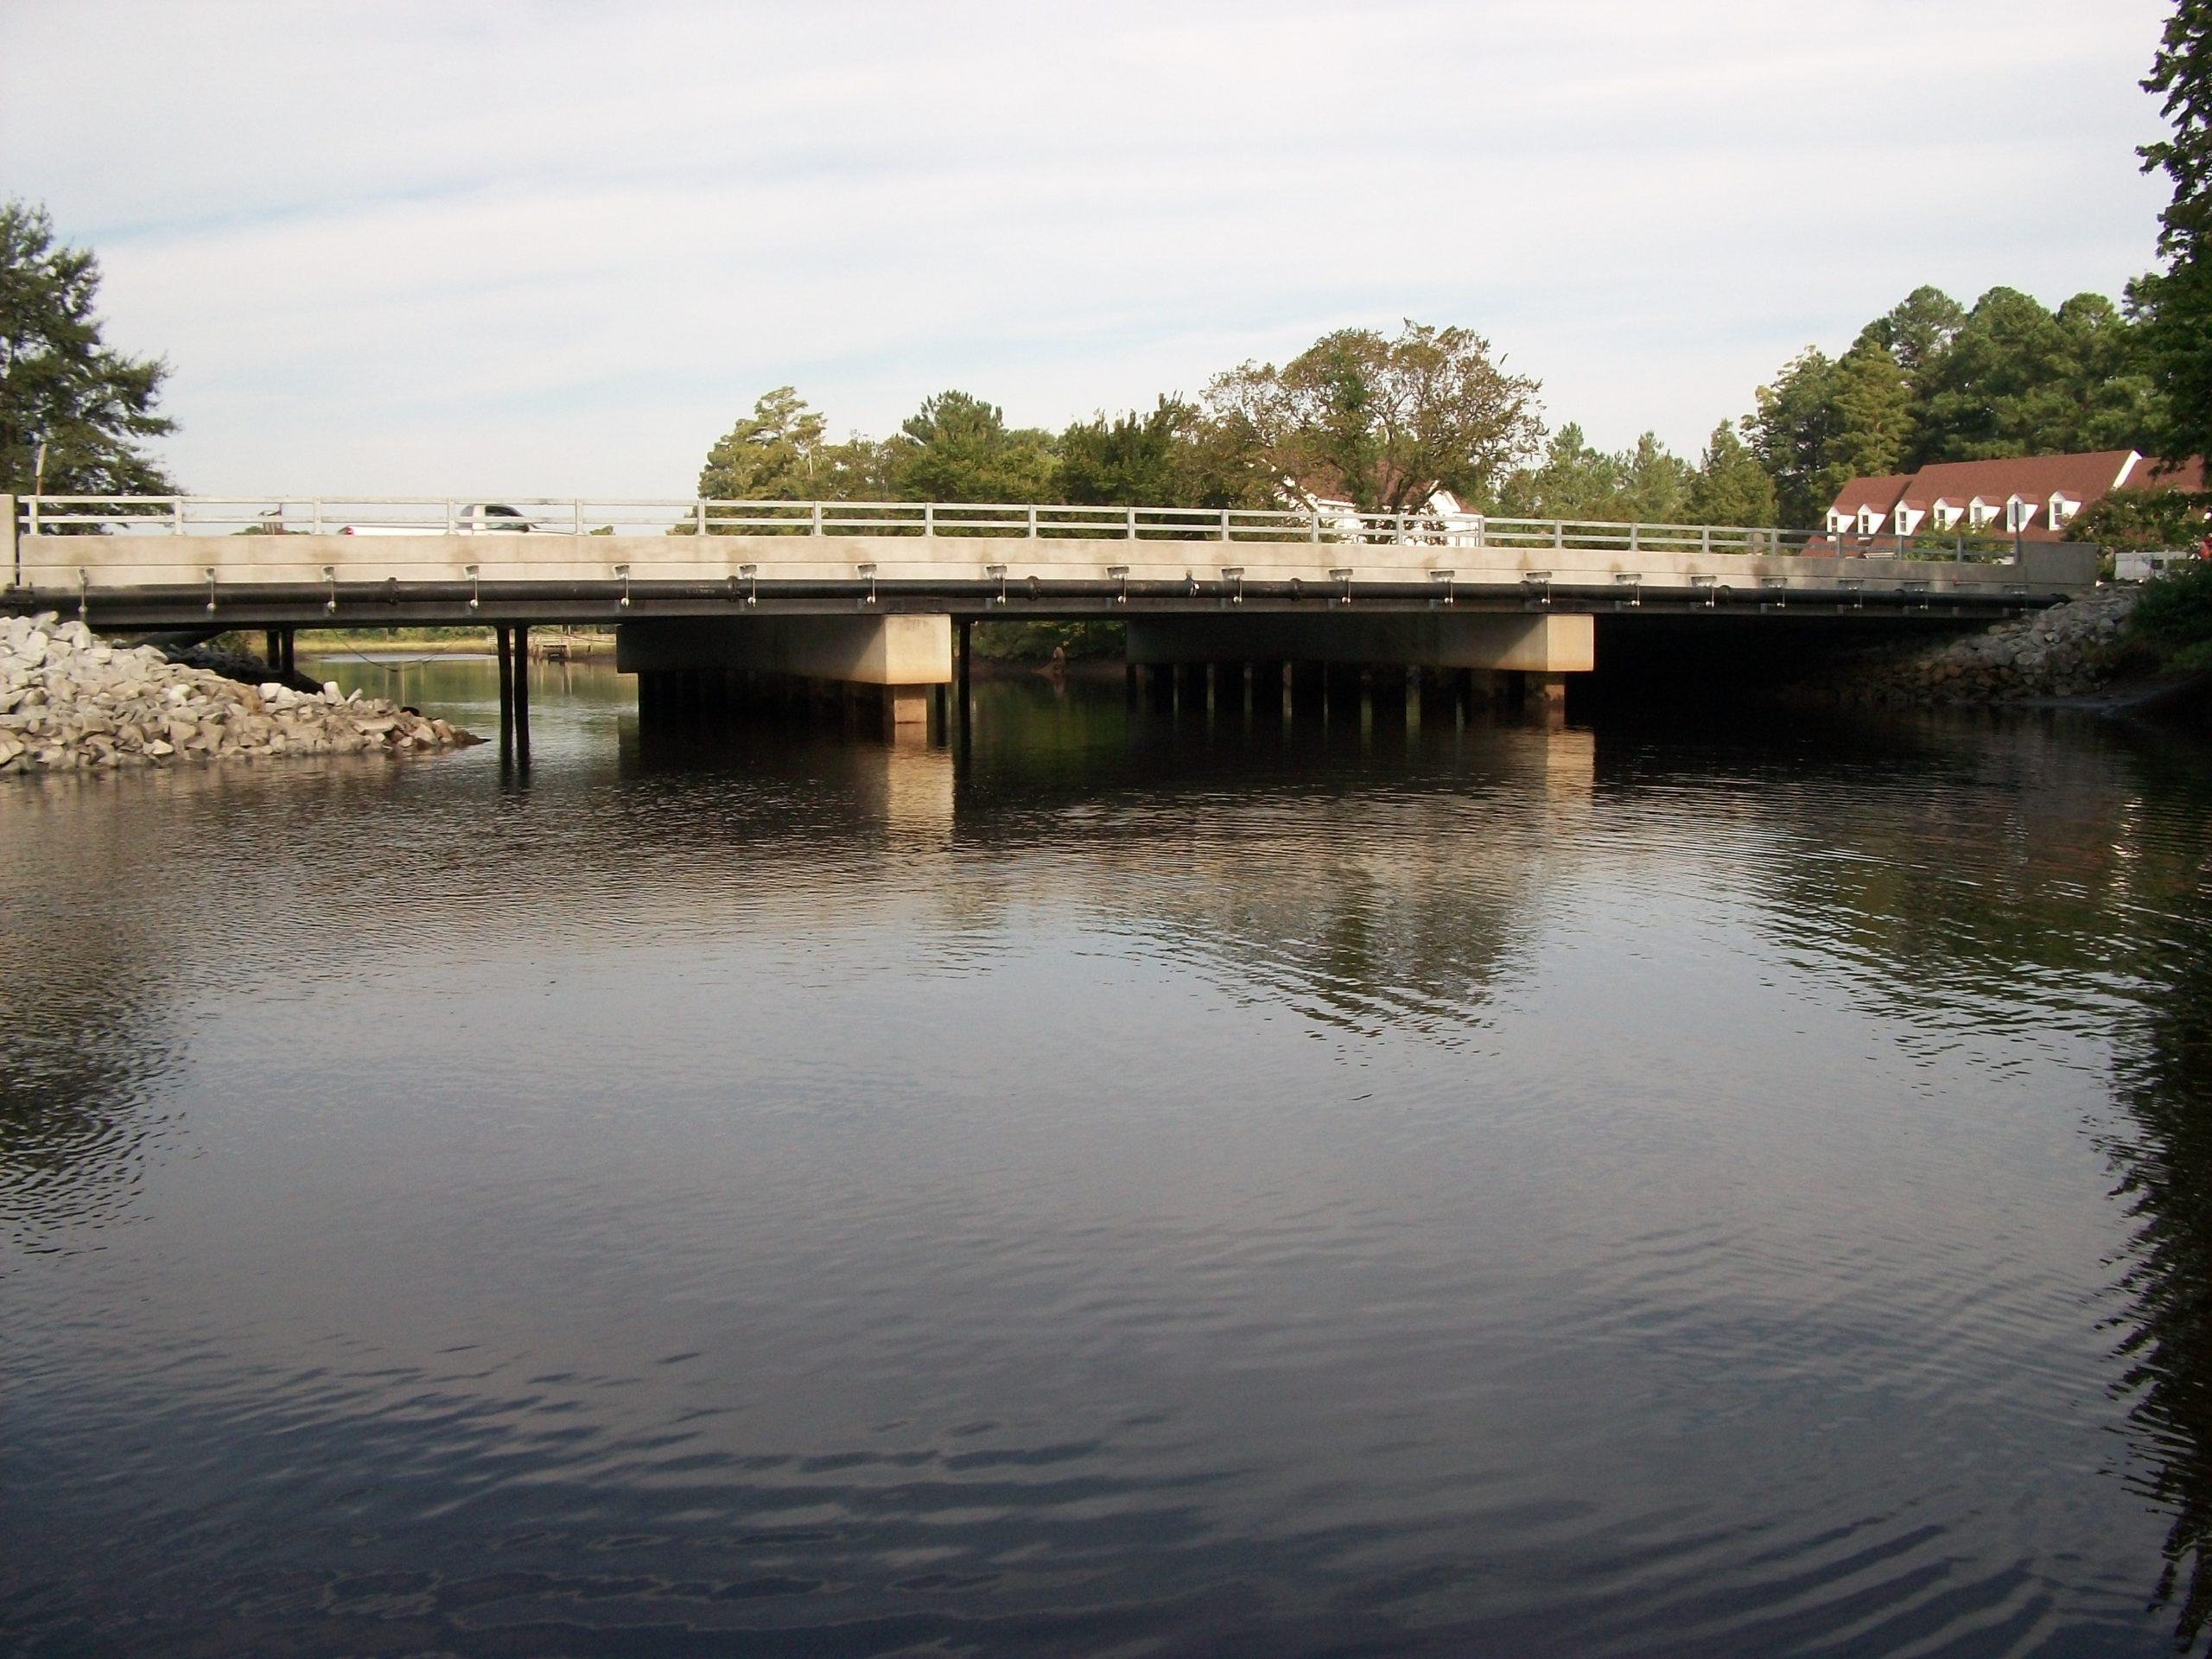 Route 17 over Deep Creek-Chesapeake, VA: Bridge replacement